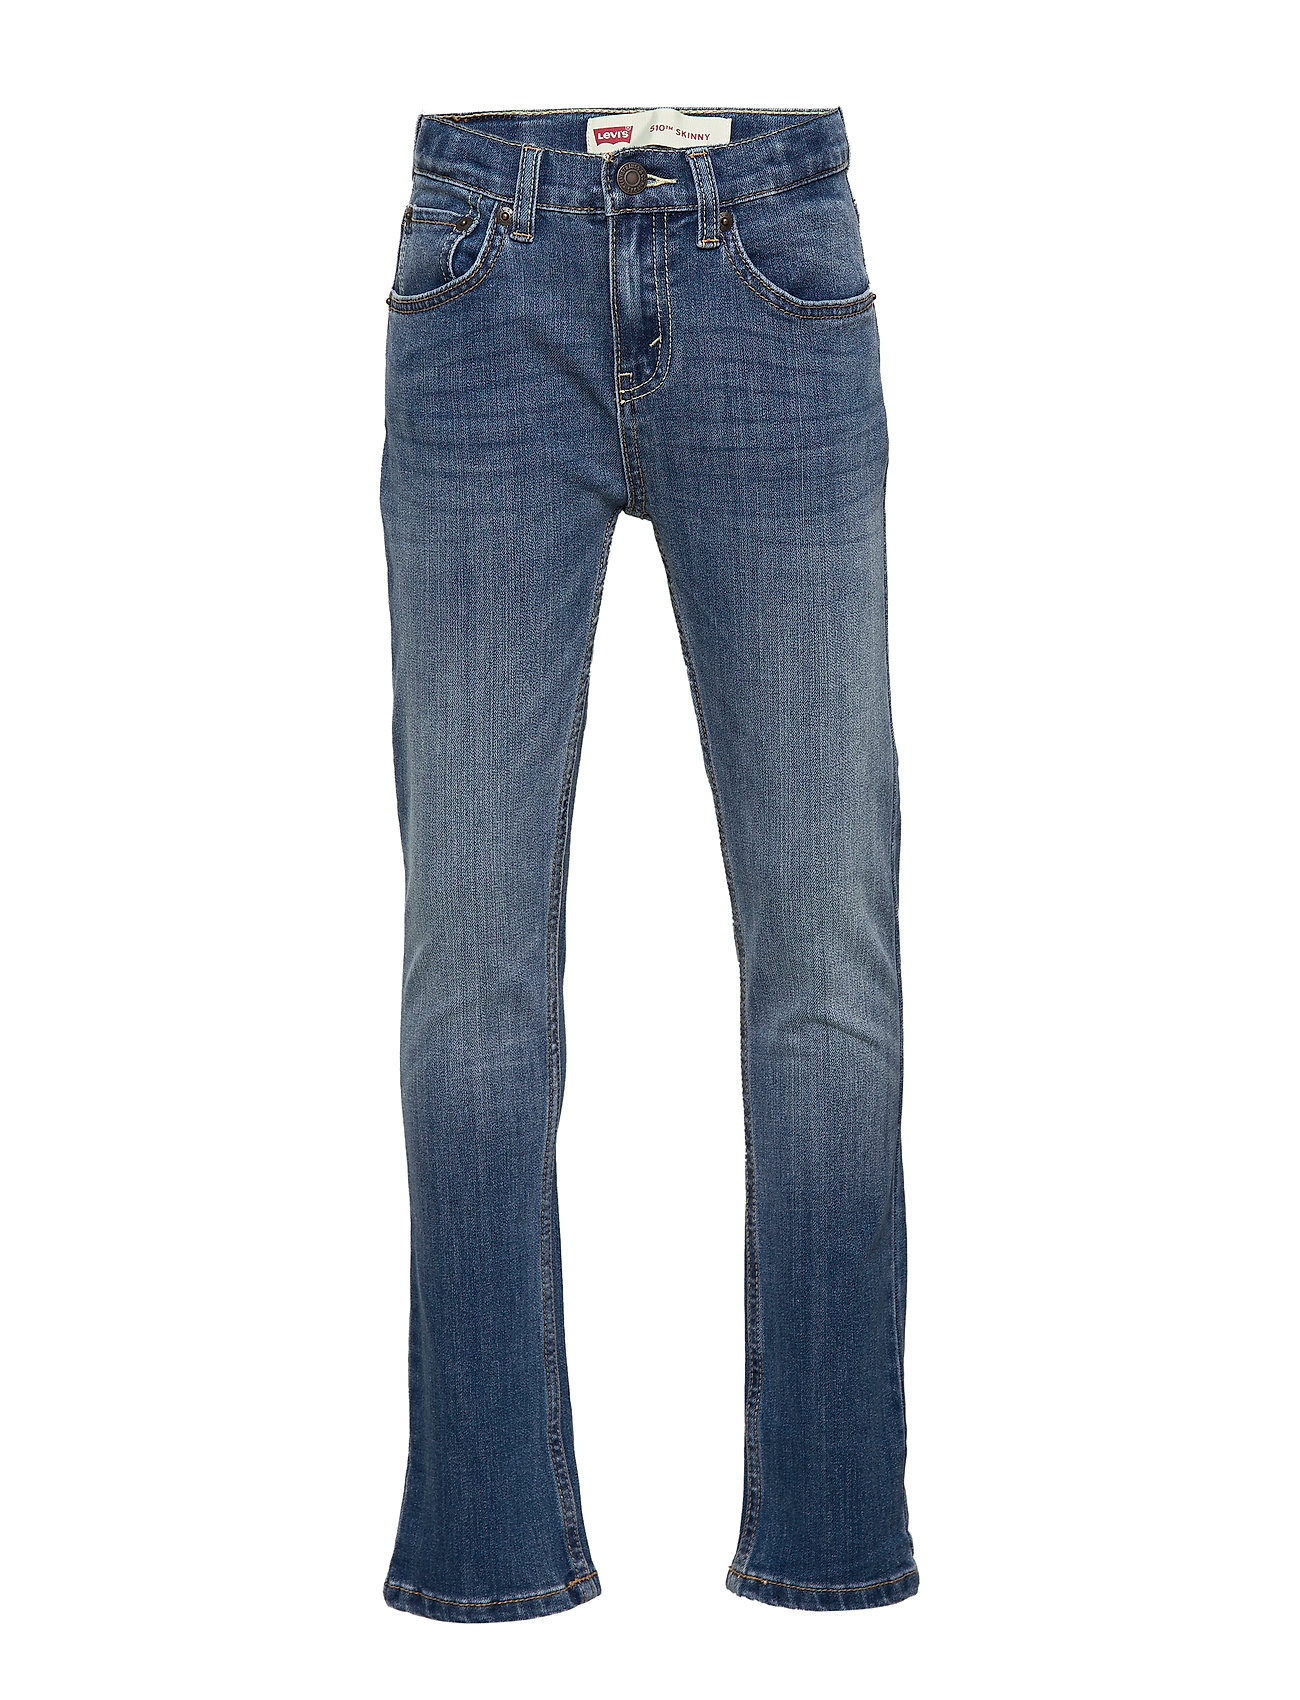 Image of 510 Bi-Stretch Jean Jeans Blå Levi's (3452169215)